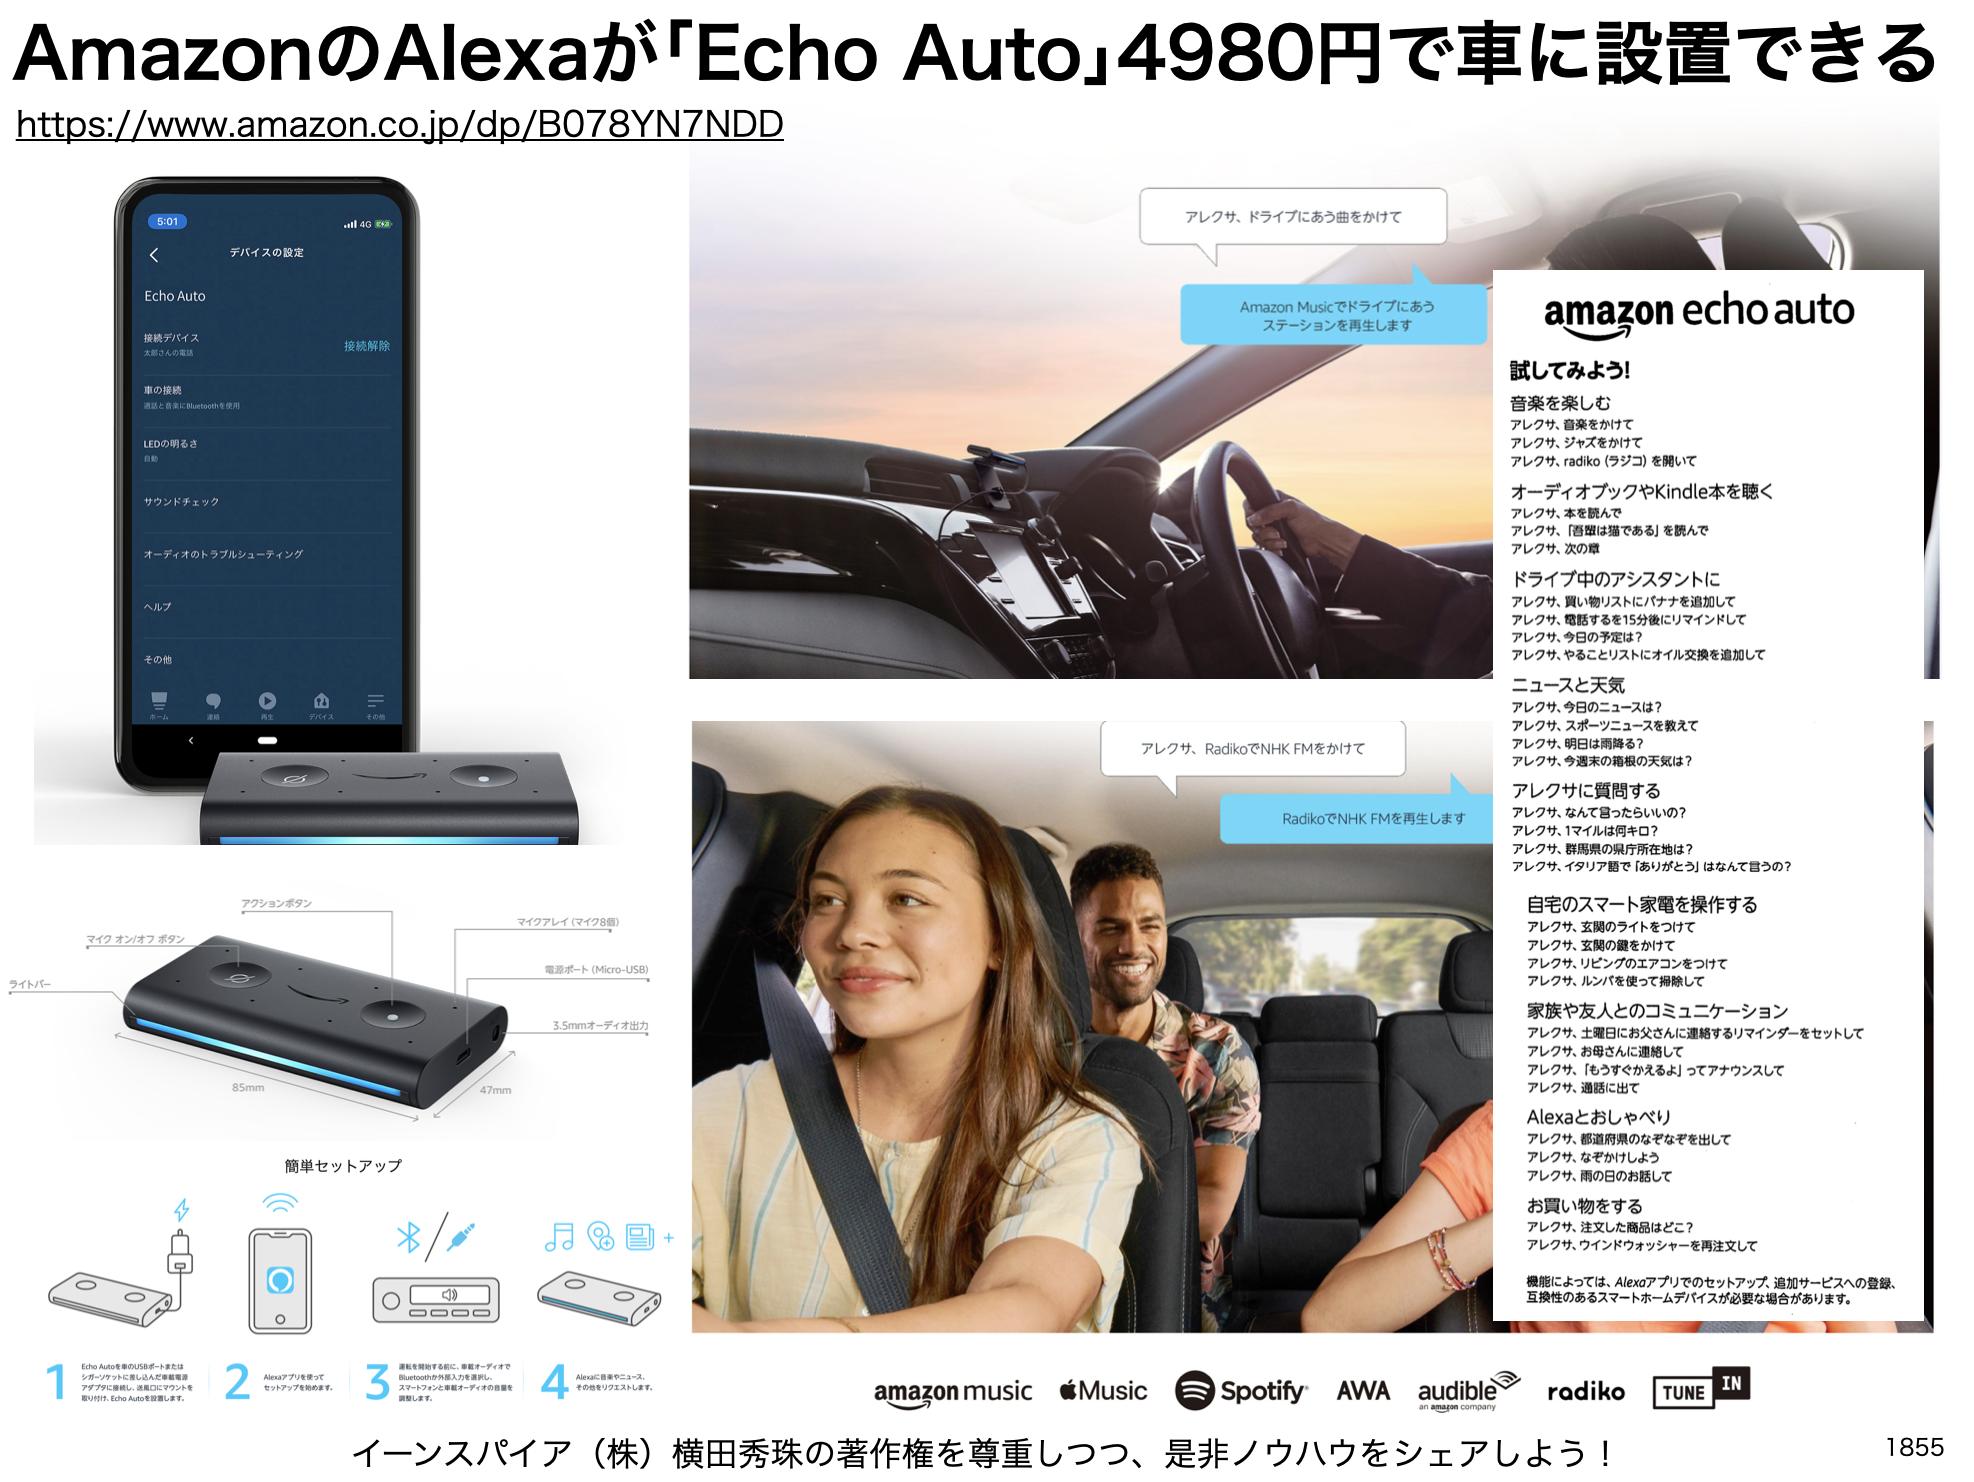 Amazon Alexa車載用「Echo Auto」使い方レビューできること